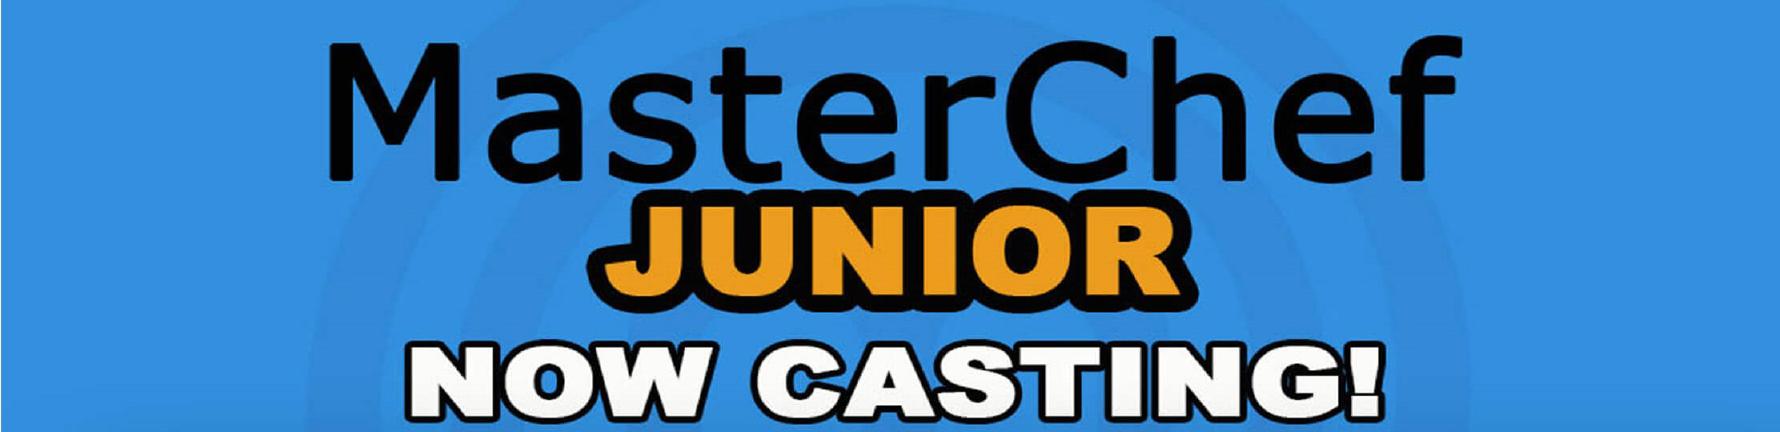 Master Chef Junior Casting Call